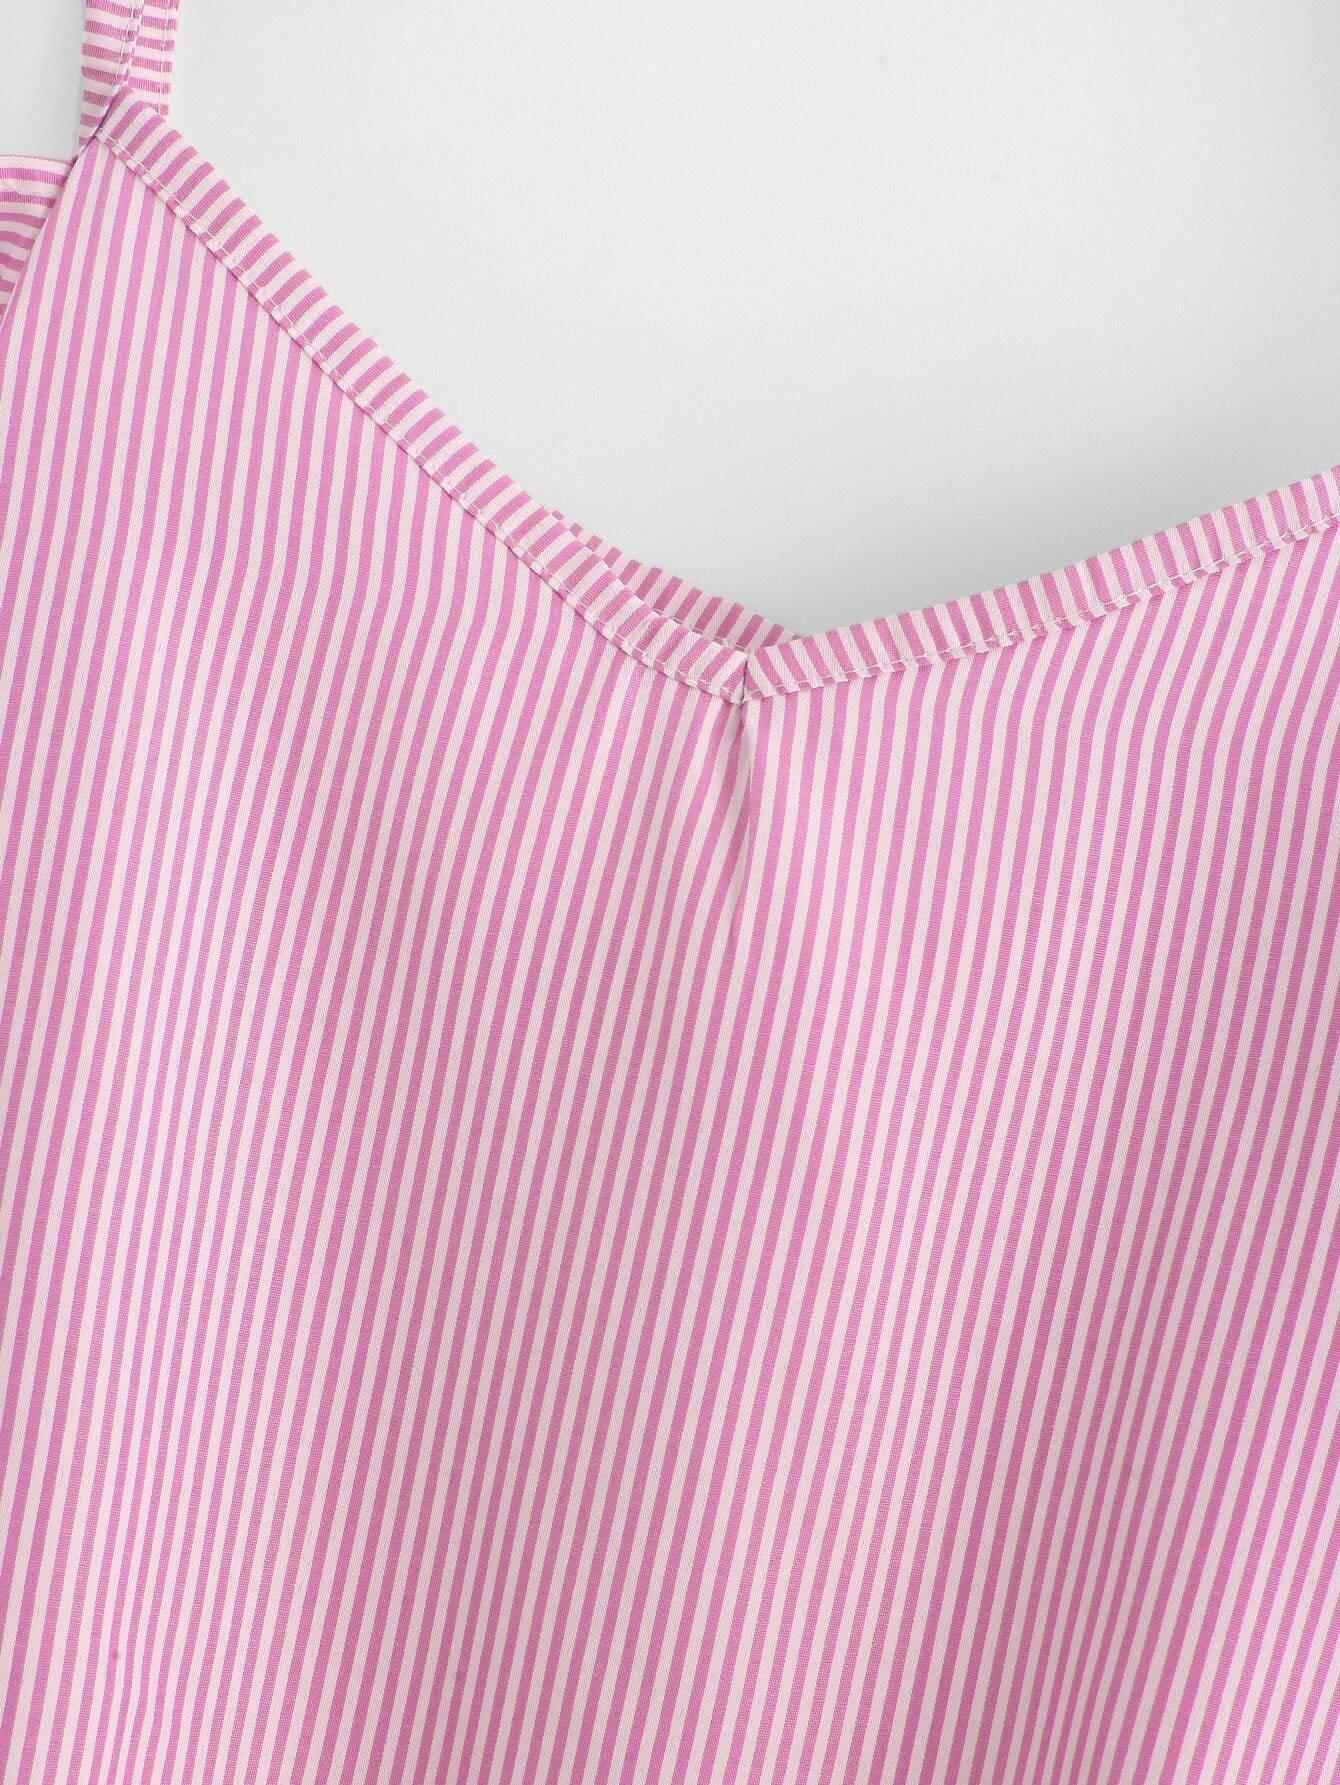 blouse170503102_2